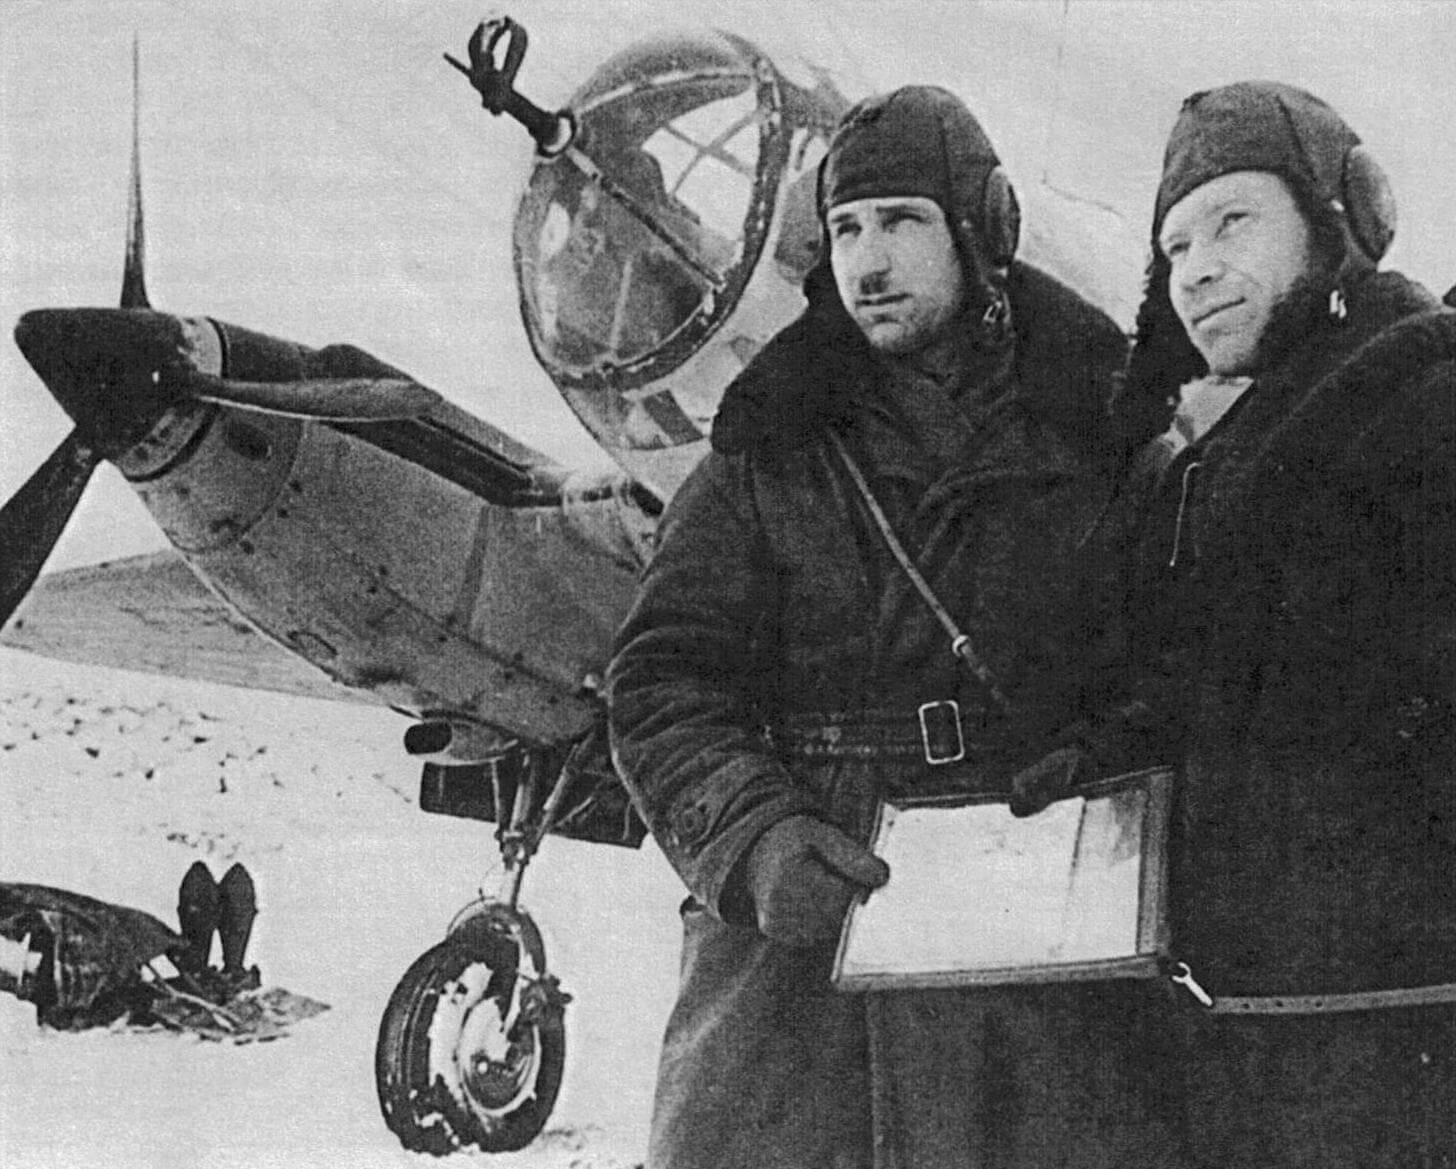 Экипаж Ар-2 на фронтовом аэродроме. Зима 1941 - 1942 гг.